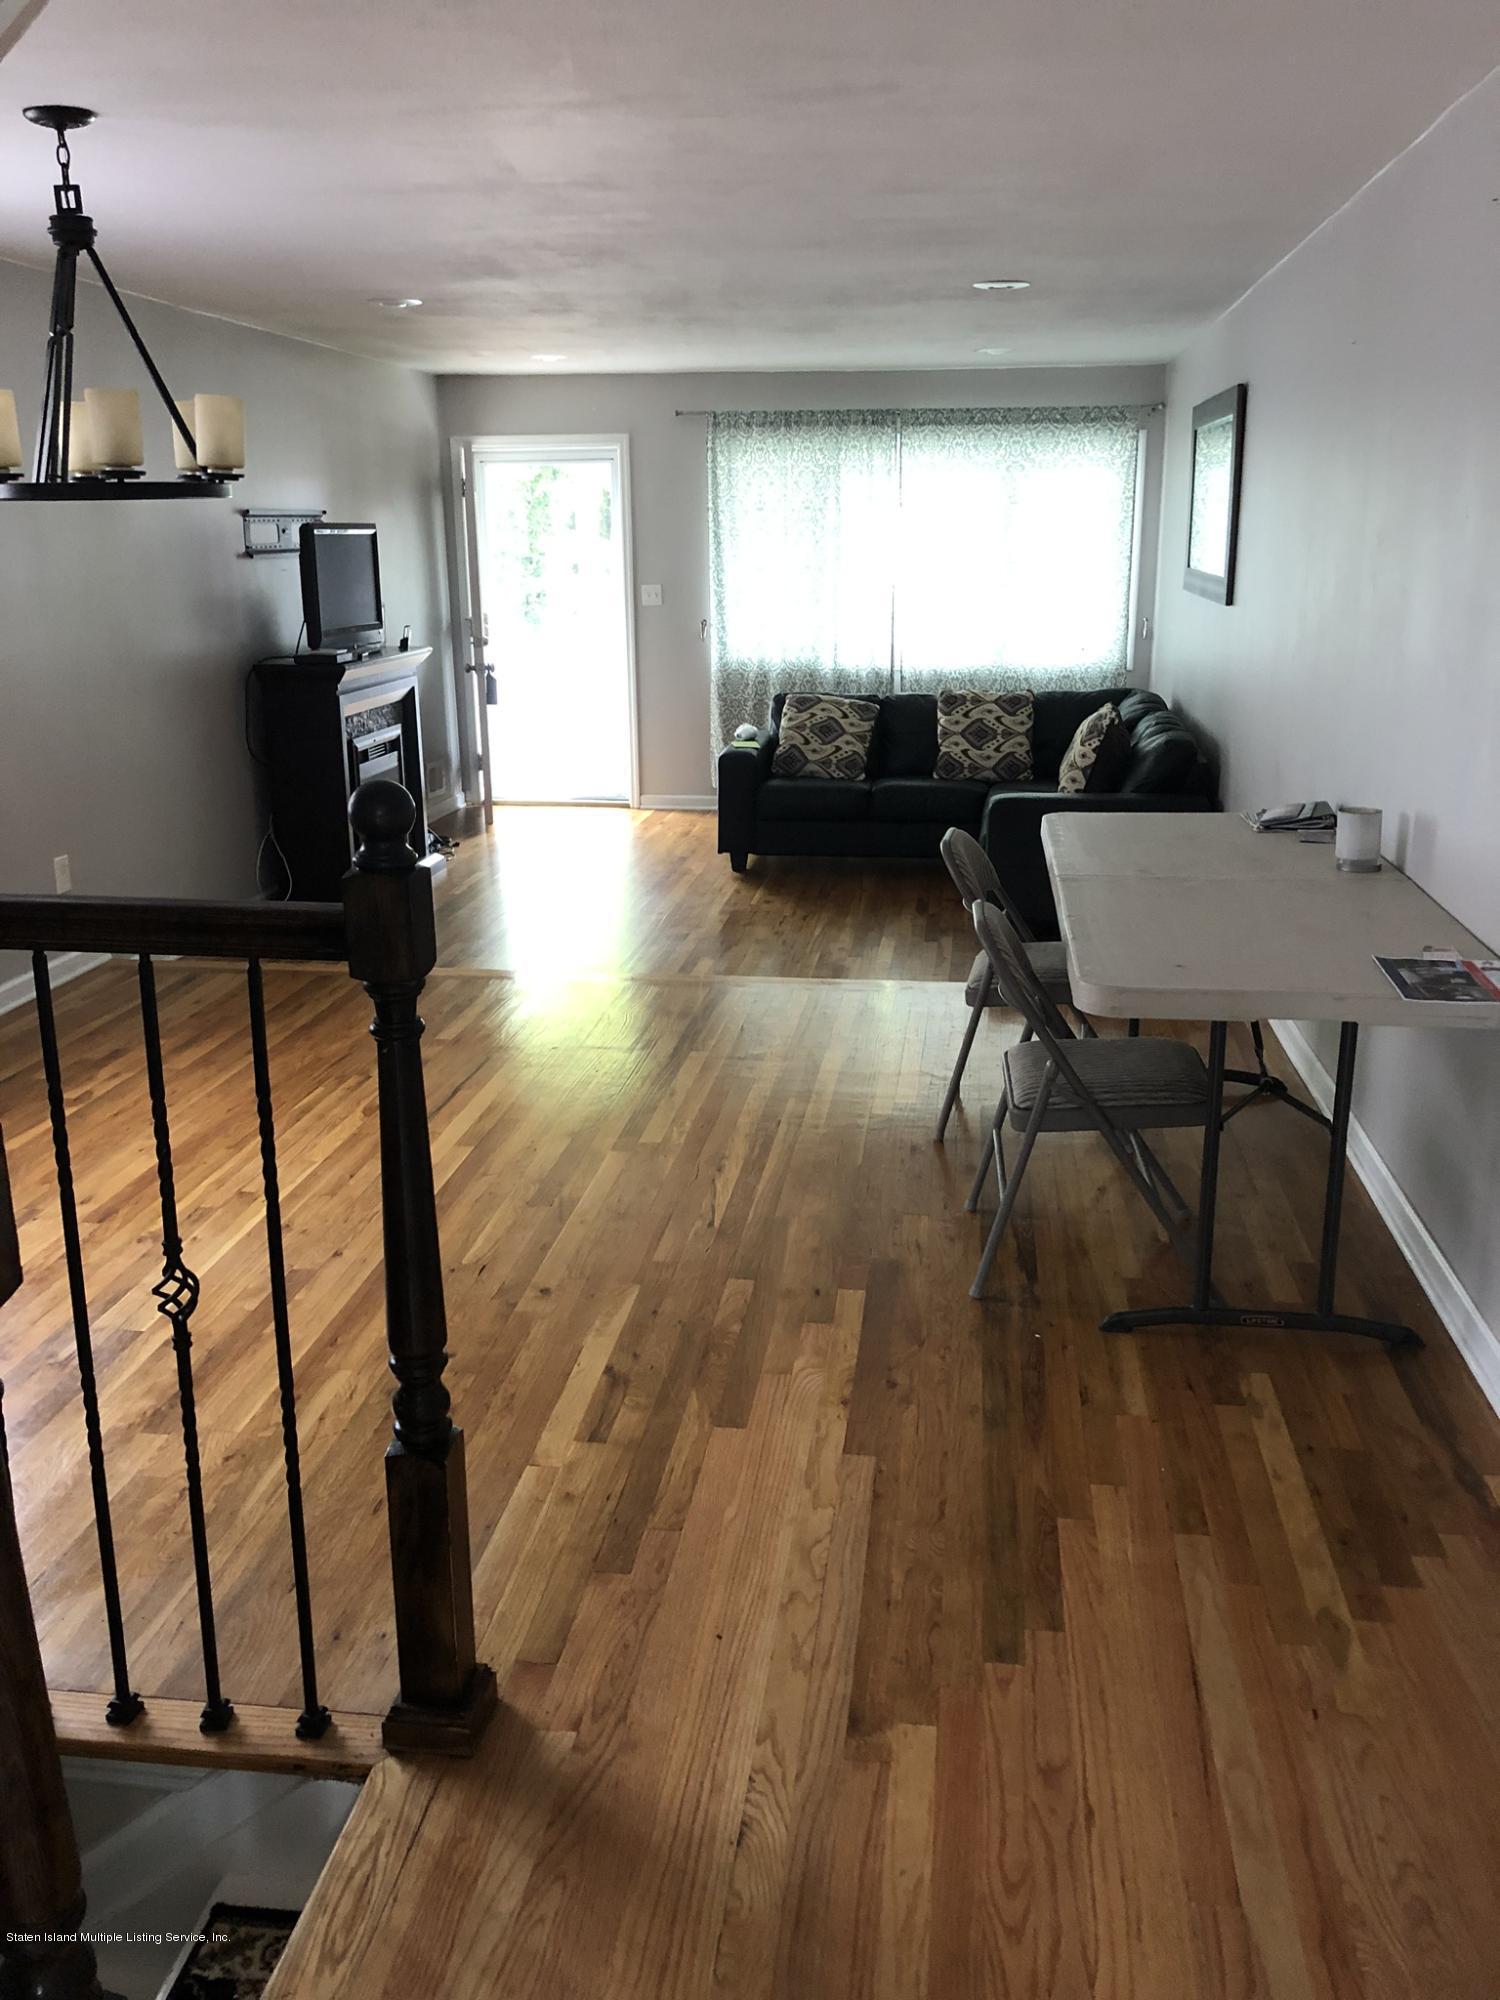 Single Family - Semi-Attached 59 Cranford Street  Staten Island, NY 10308, MLS-1128460-11